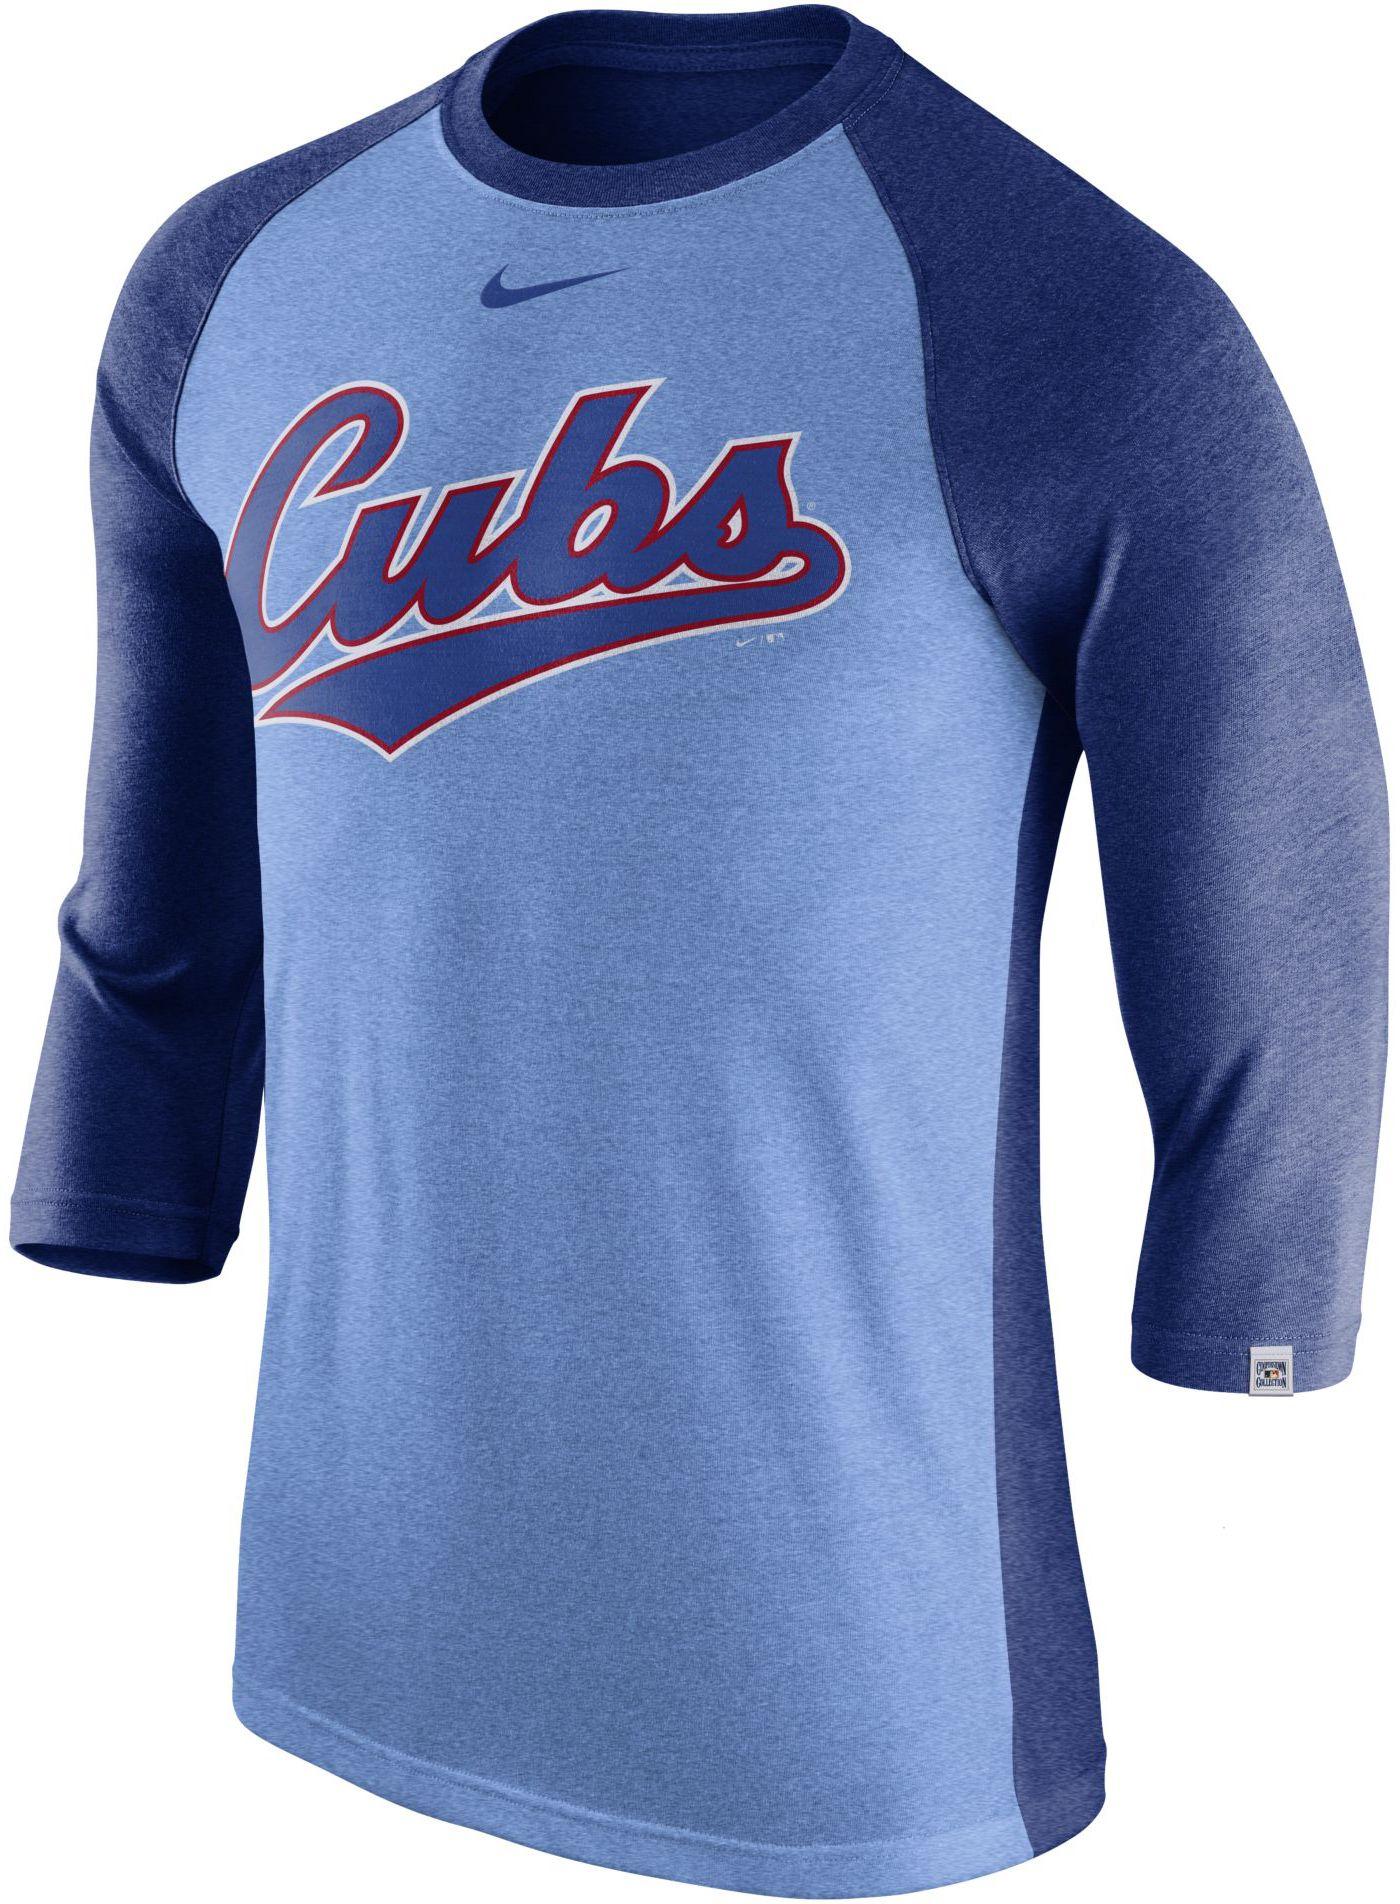 Nike Men's Chicago Cubs Dri-FIT Raglan Three-Quarter Sleeve Shirt